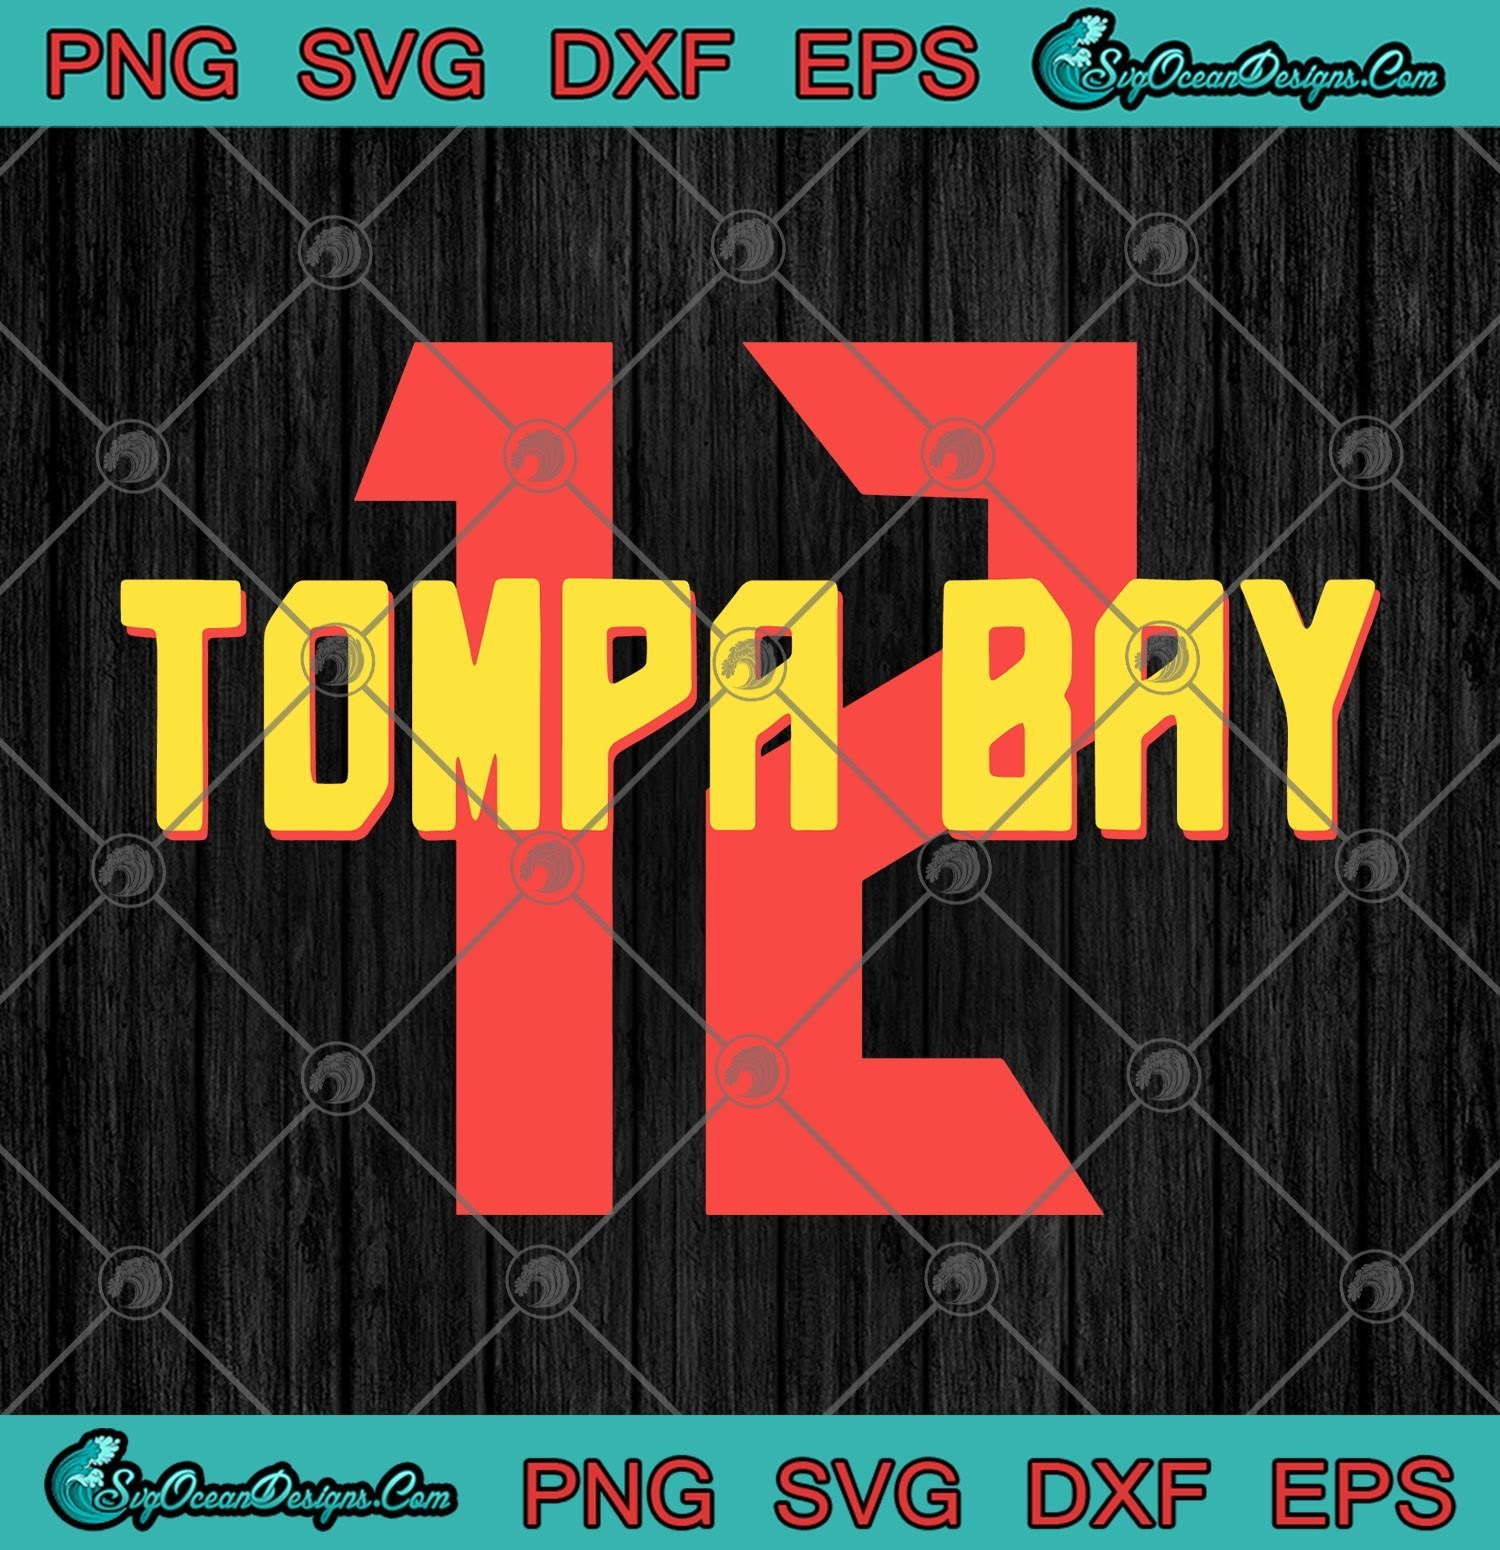 Tom Brady 12 Tampa Bay Buccaneers Svg Png Eps By Taylkesvg On Zibbet